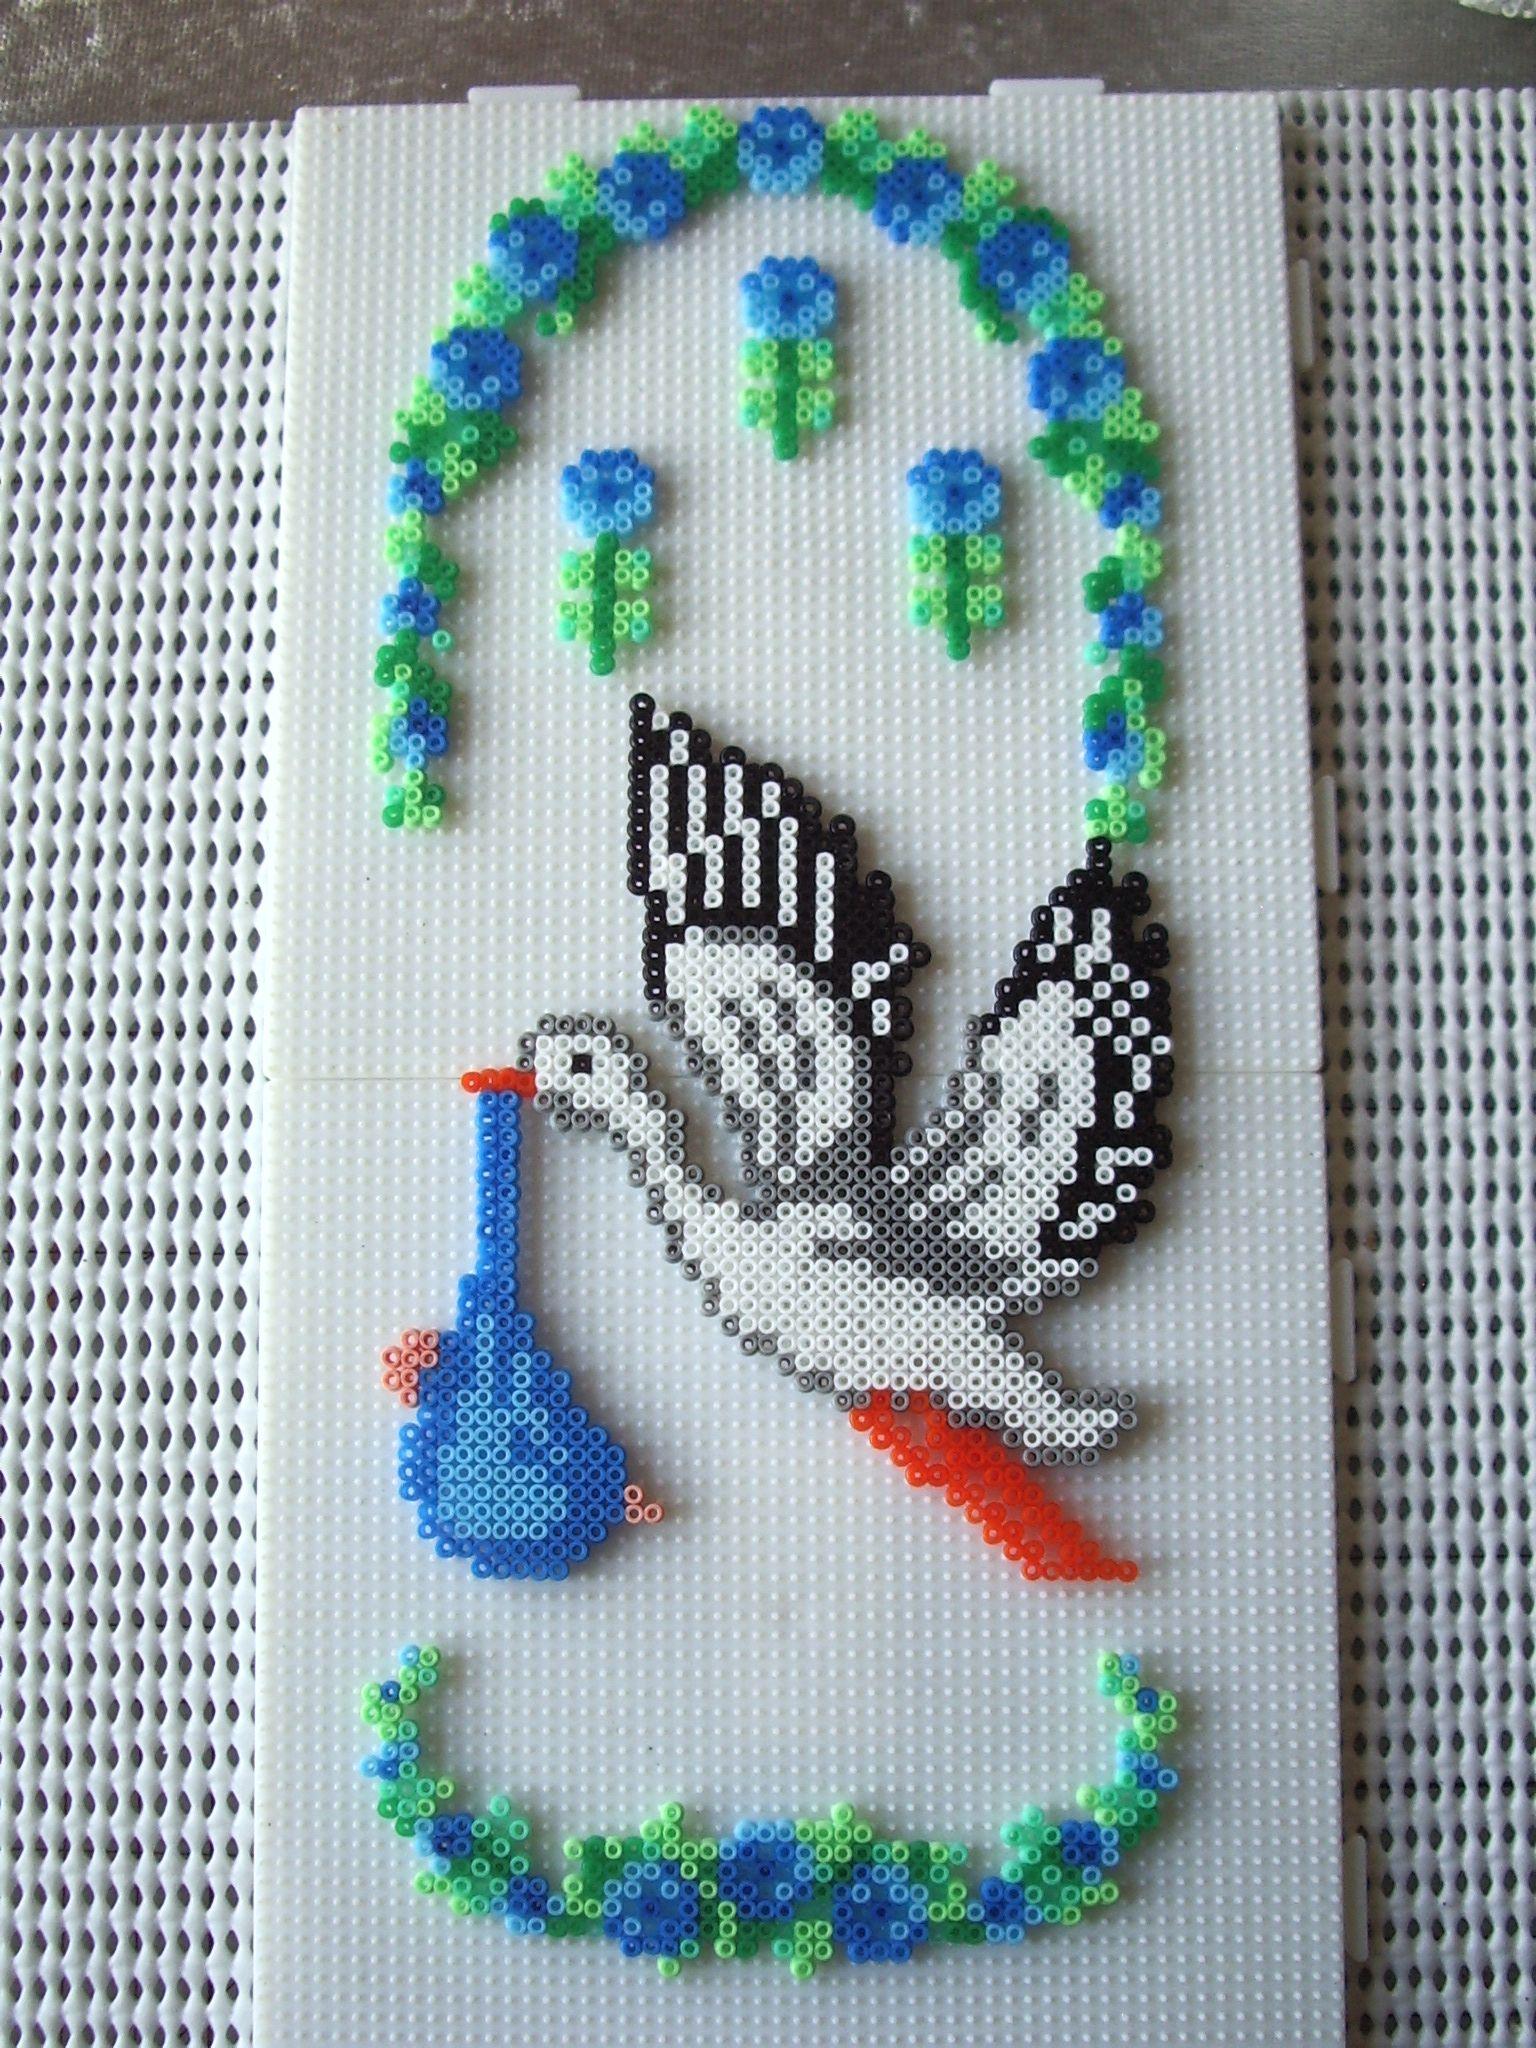 Baby new born hama beads by Marianne Korsgaard